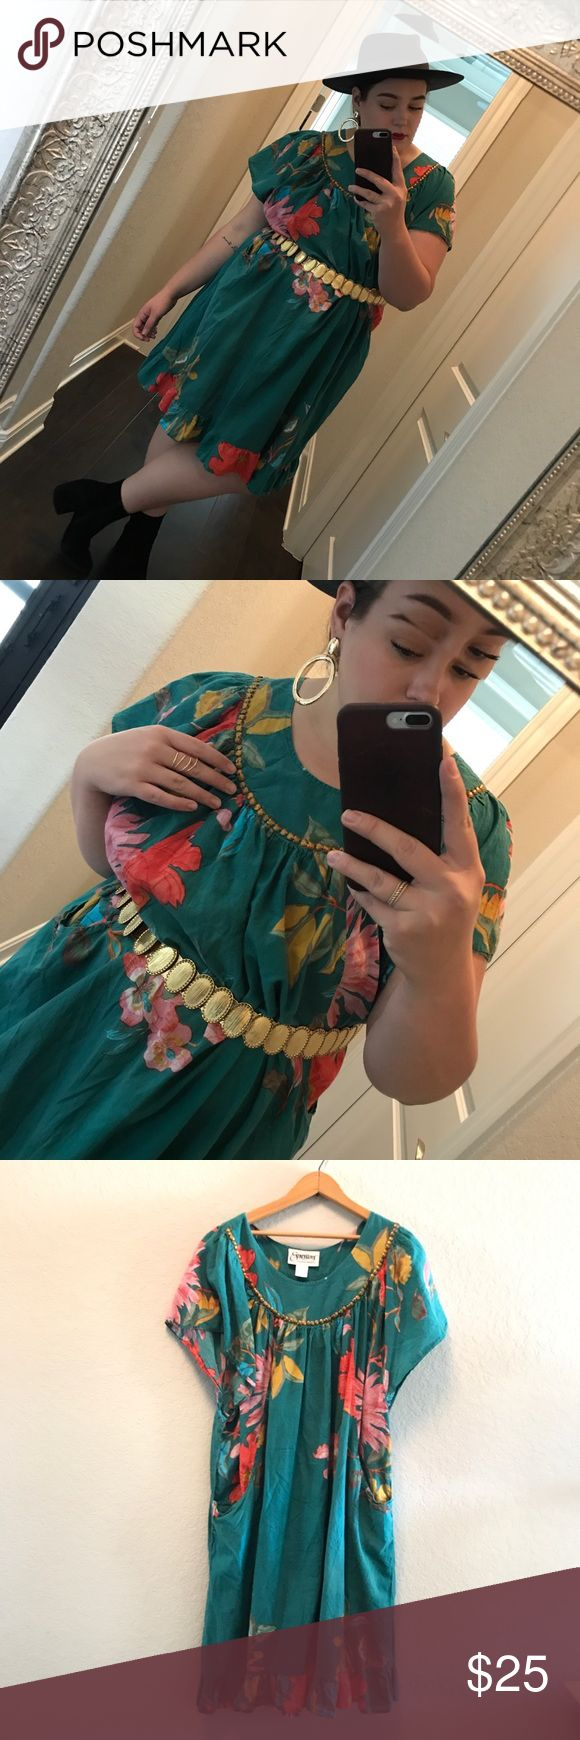 Vintage expressions boho floral dress A pretty teal boho style dress. Studded de…